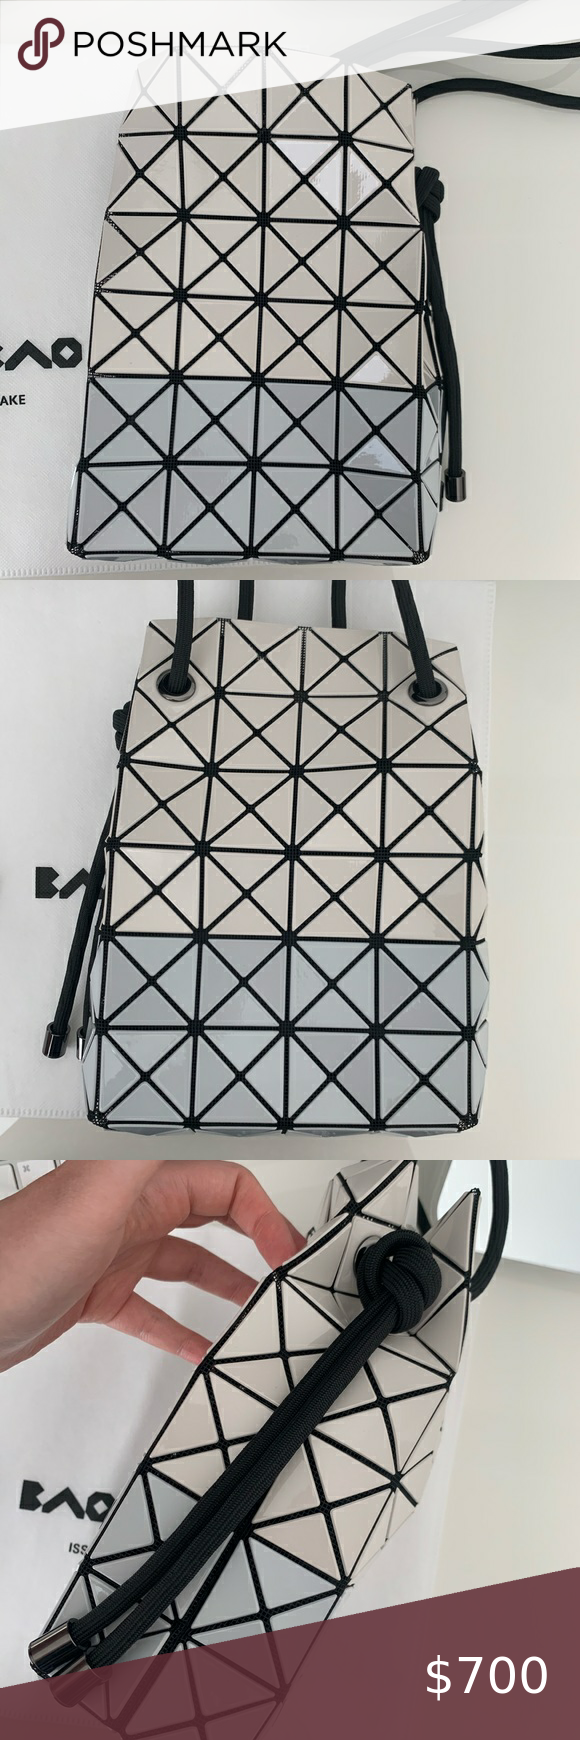 Bao Bao Issey Miyake Wring Bi Color Shoulder Bag Shoulder Bag Bao Bao Issey Miyake Issey Miyake